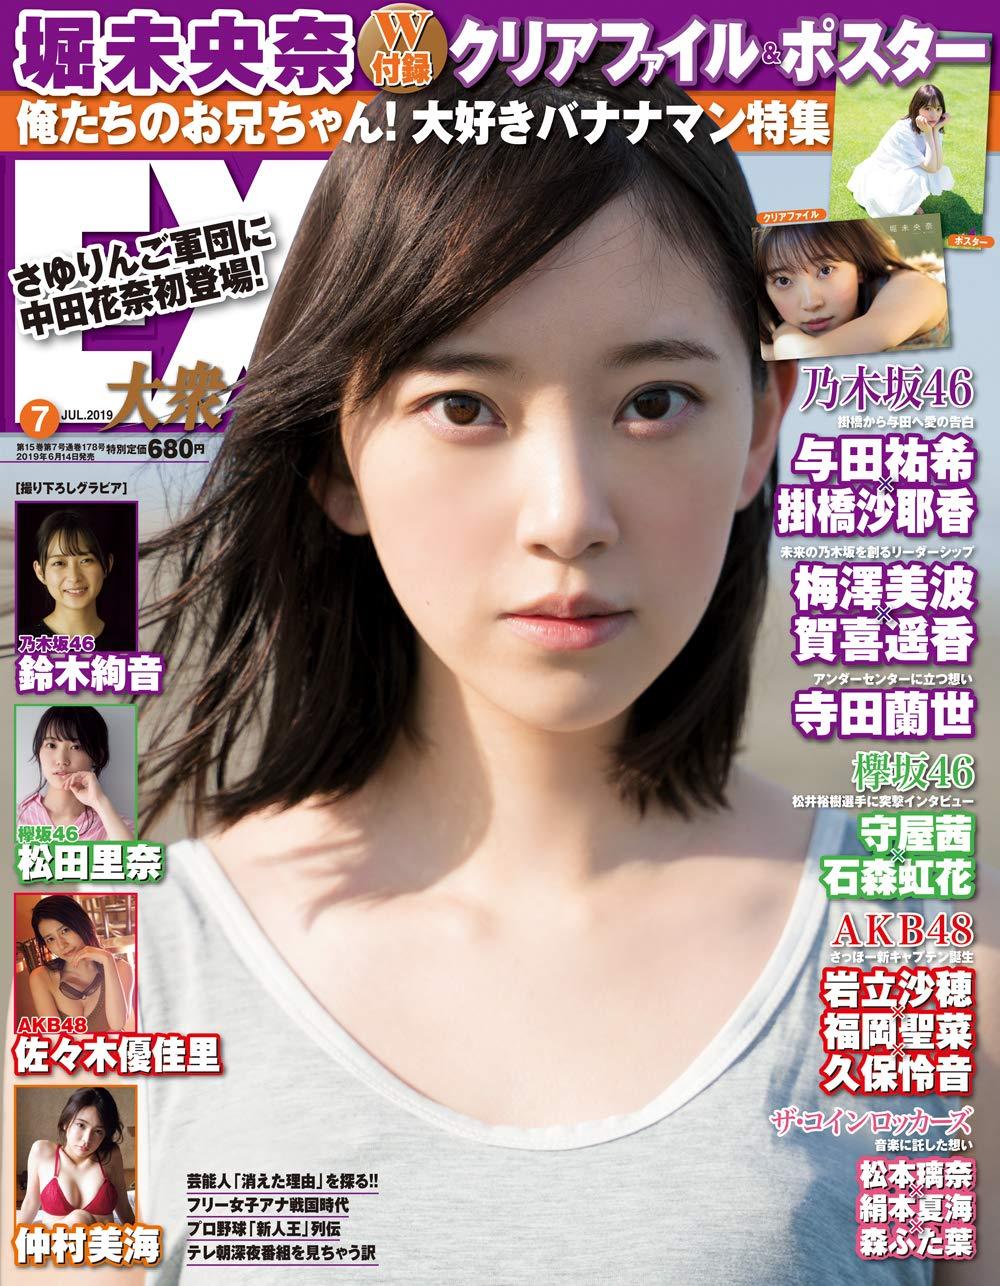 EX (イーエックス) 大衆 2019年7月号 [雑誌]